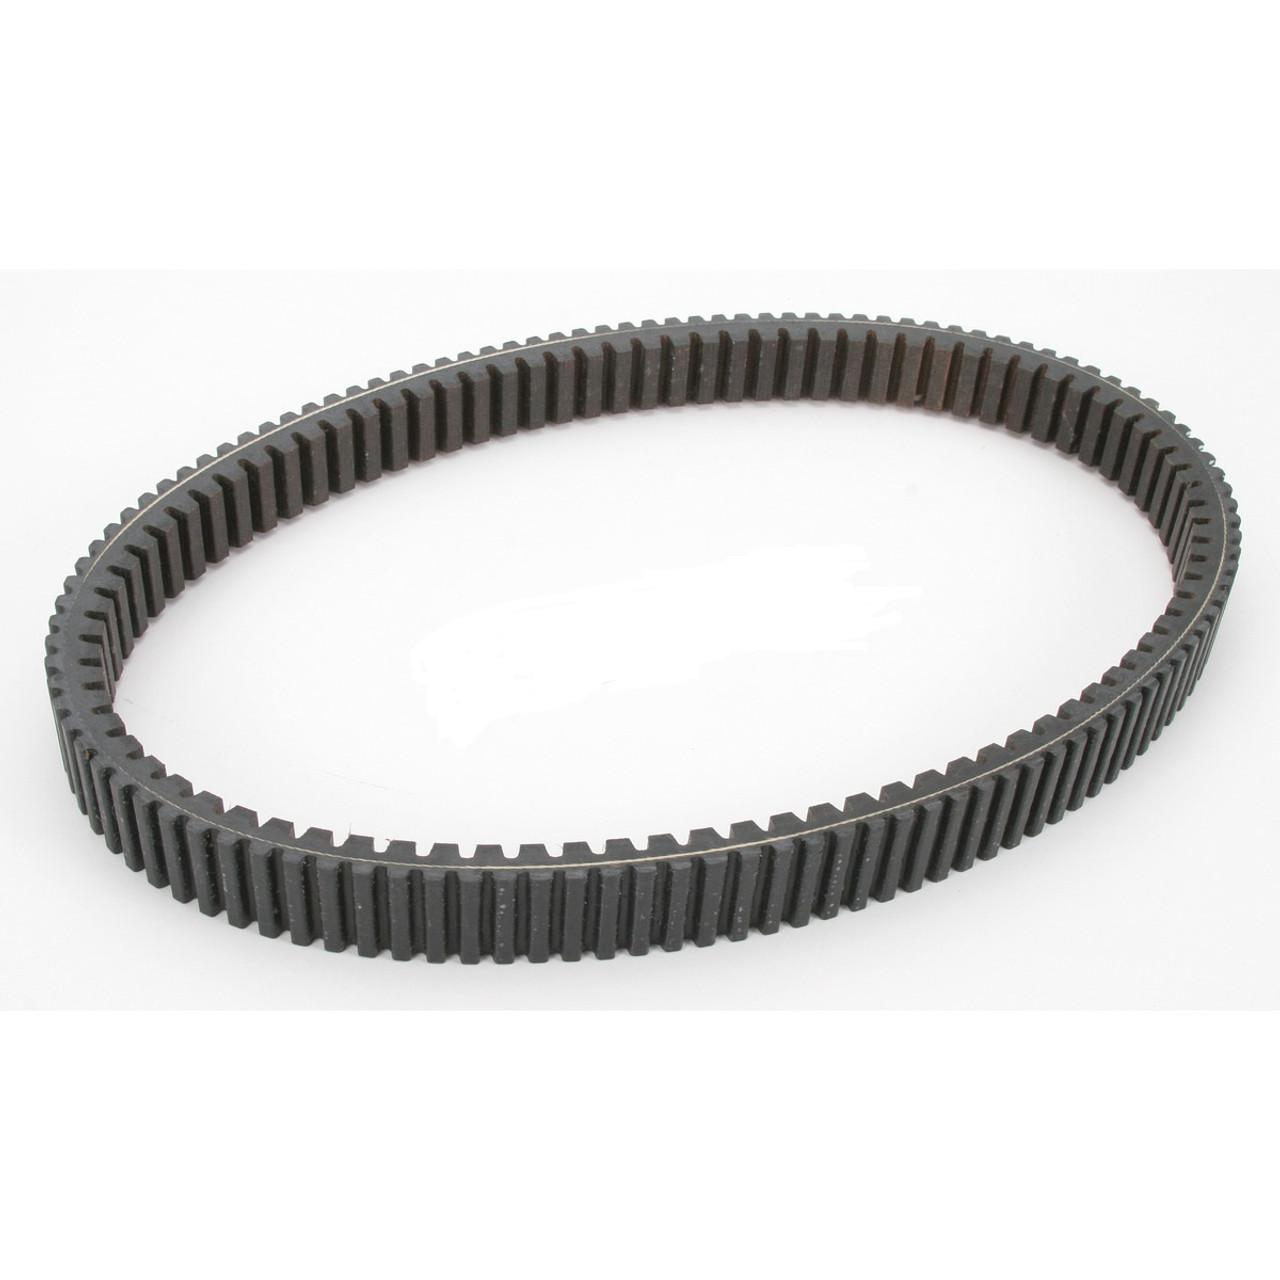 cfmoto performance atv utv 500cc 400 600 625 drive belt replaces cf188 055000 whygostock com [ 1200 x 1200 Pixel ]